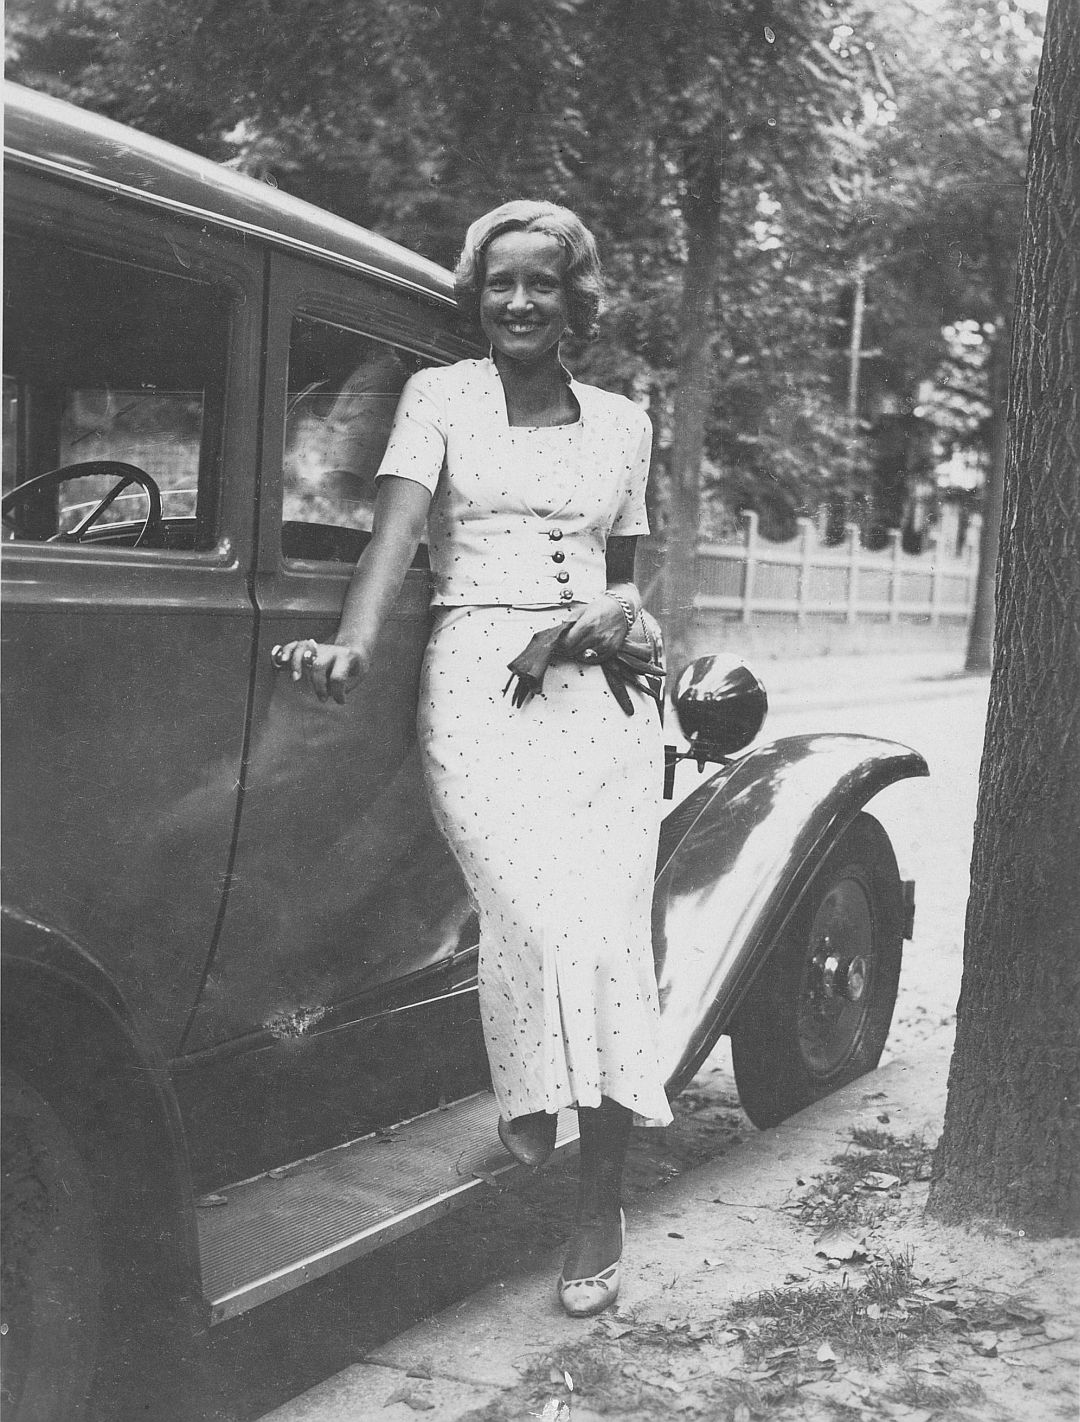 Pontiac_Modell_1929_Galerie